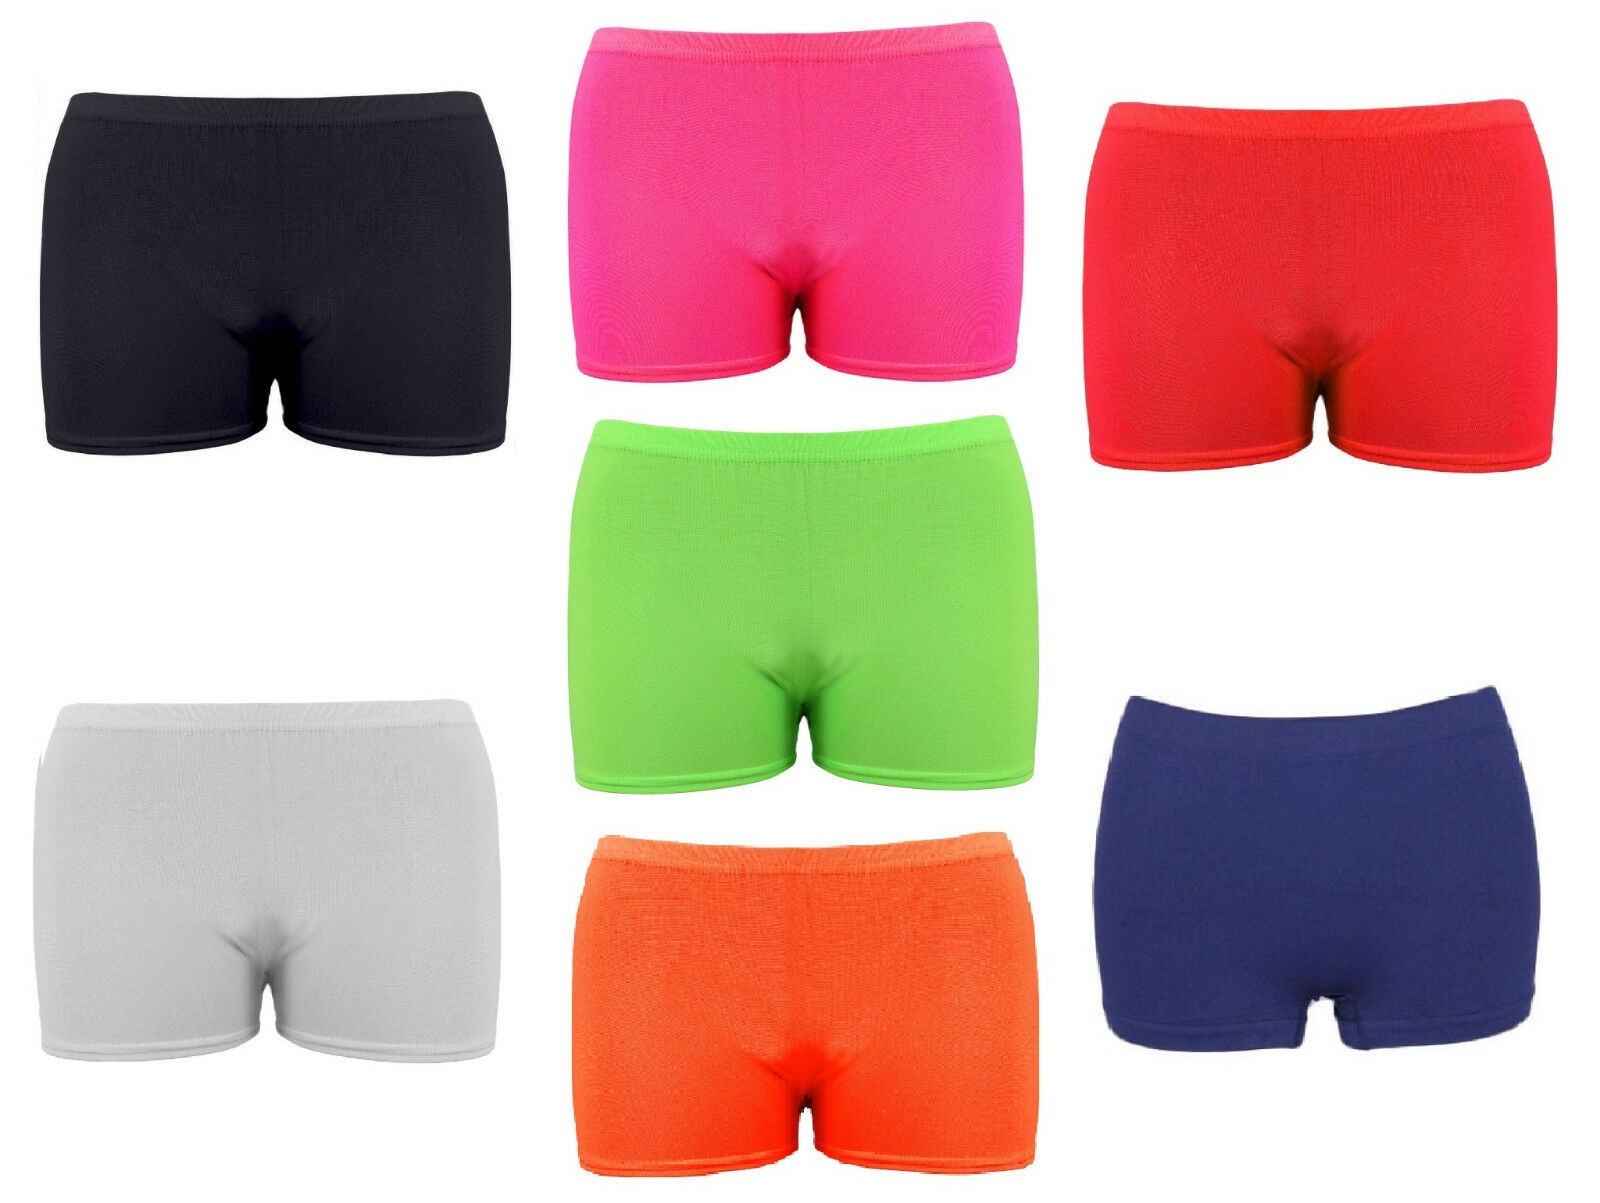 Mädchen Mikrofaser Hotpants Shorts Schule Tanz Gym Lycra-Stretch Alter 5-14